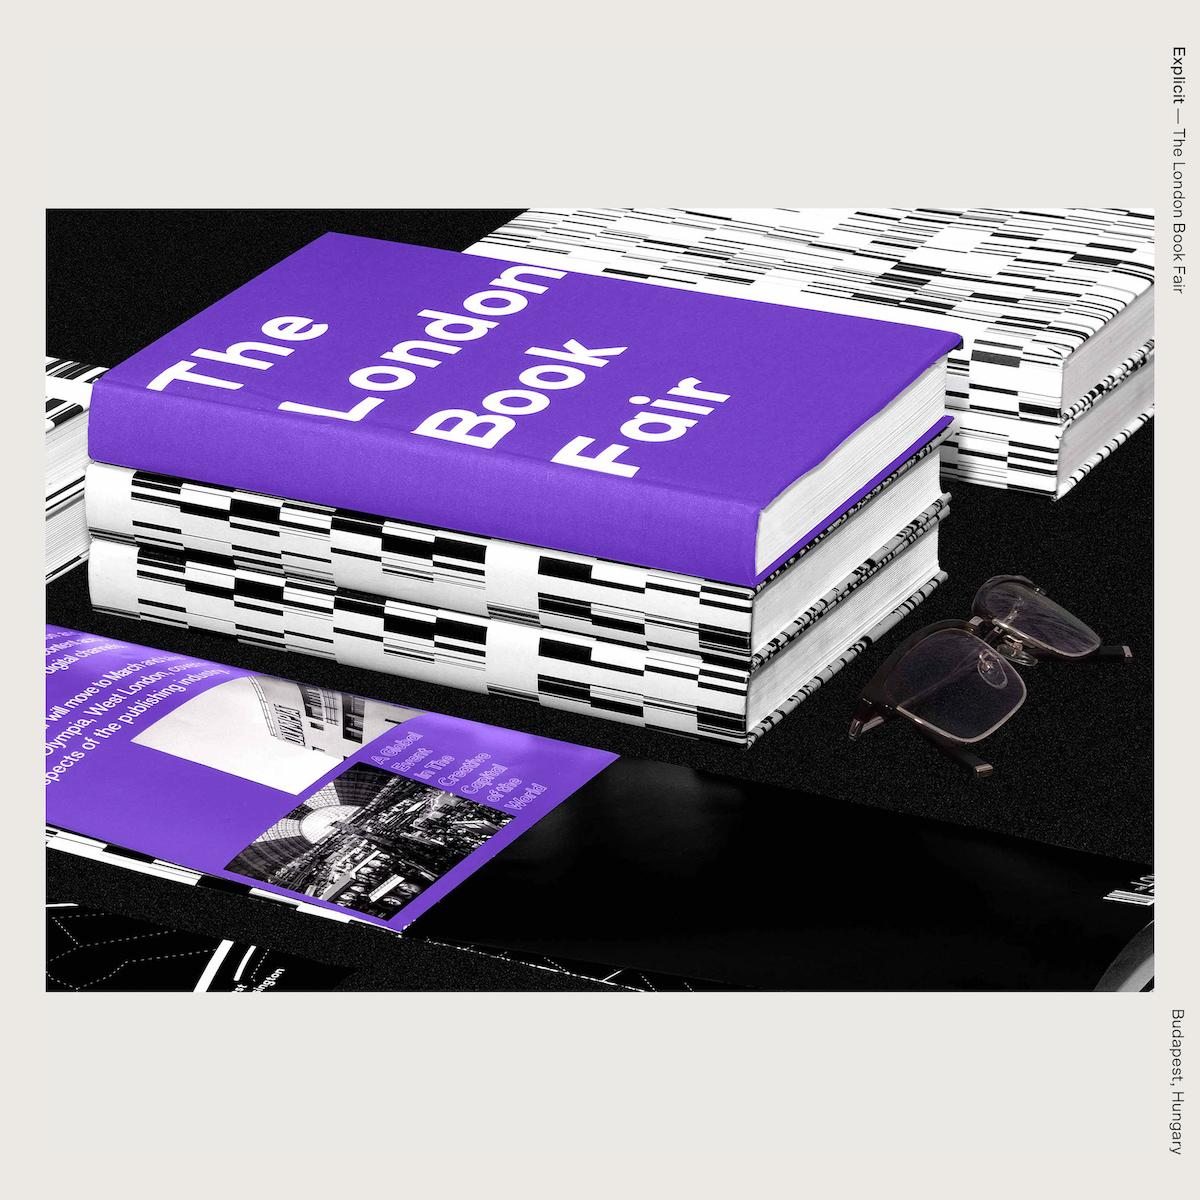 Explicit — The London Book Fair